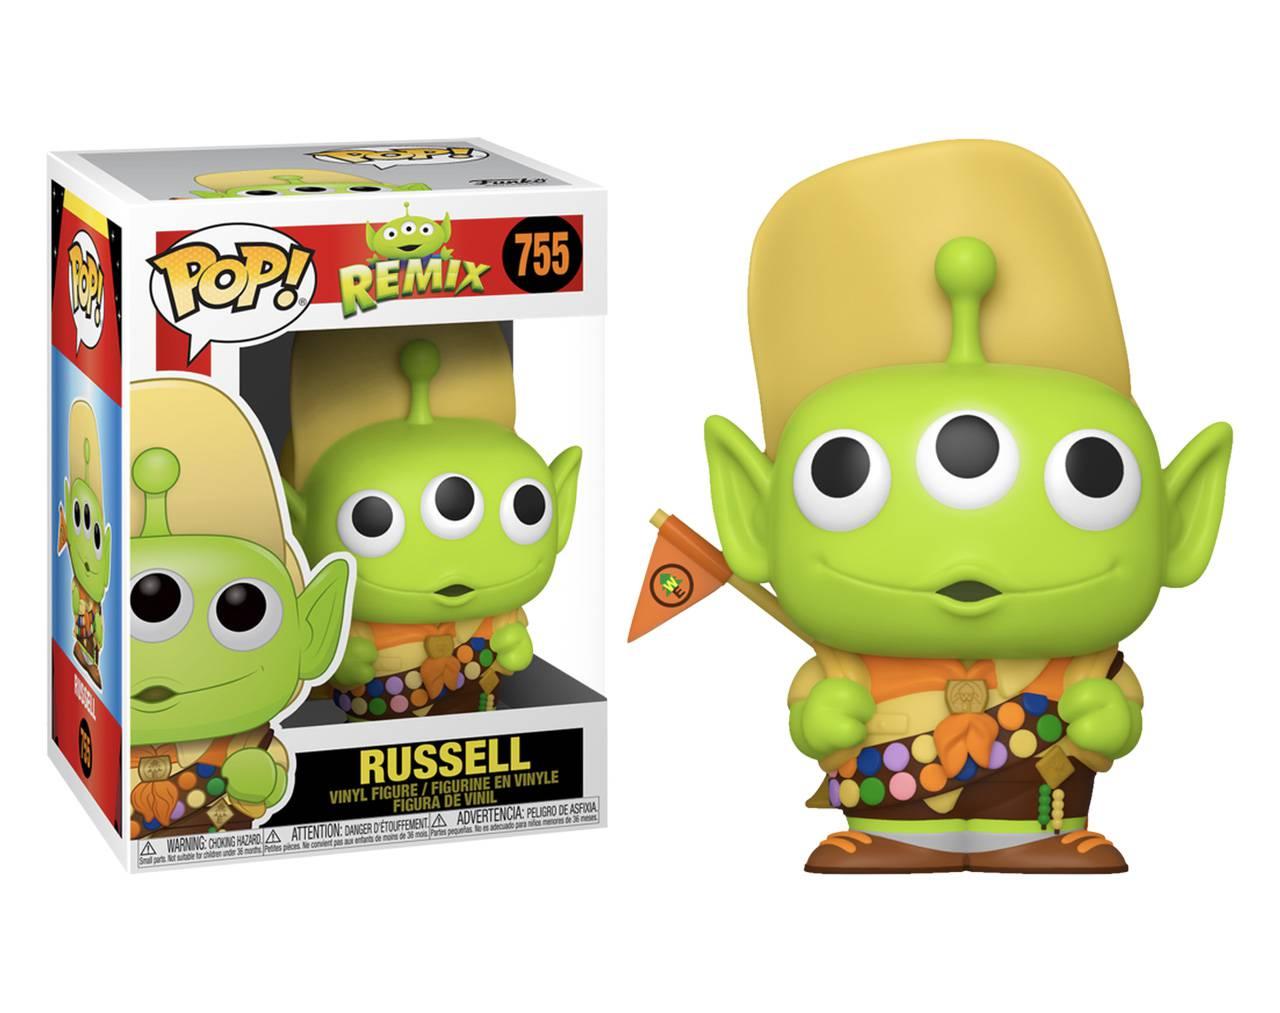 Alien (Russell) Pop! Vinyl